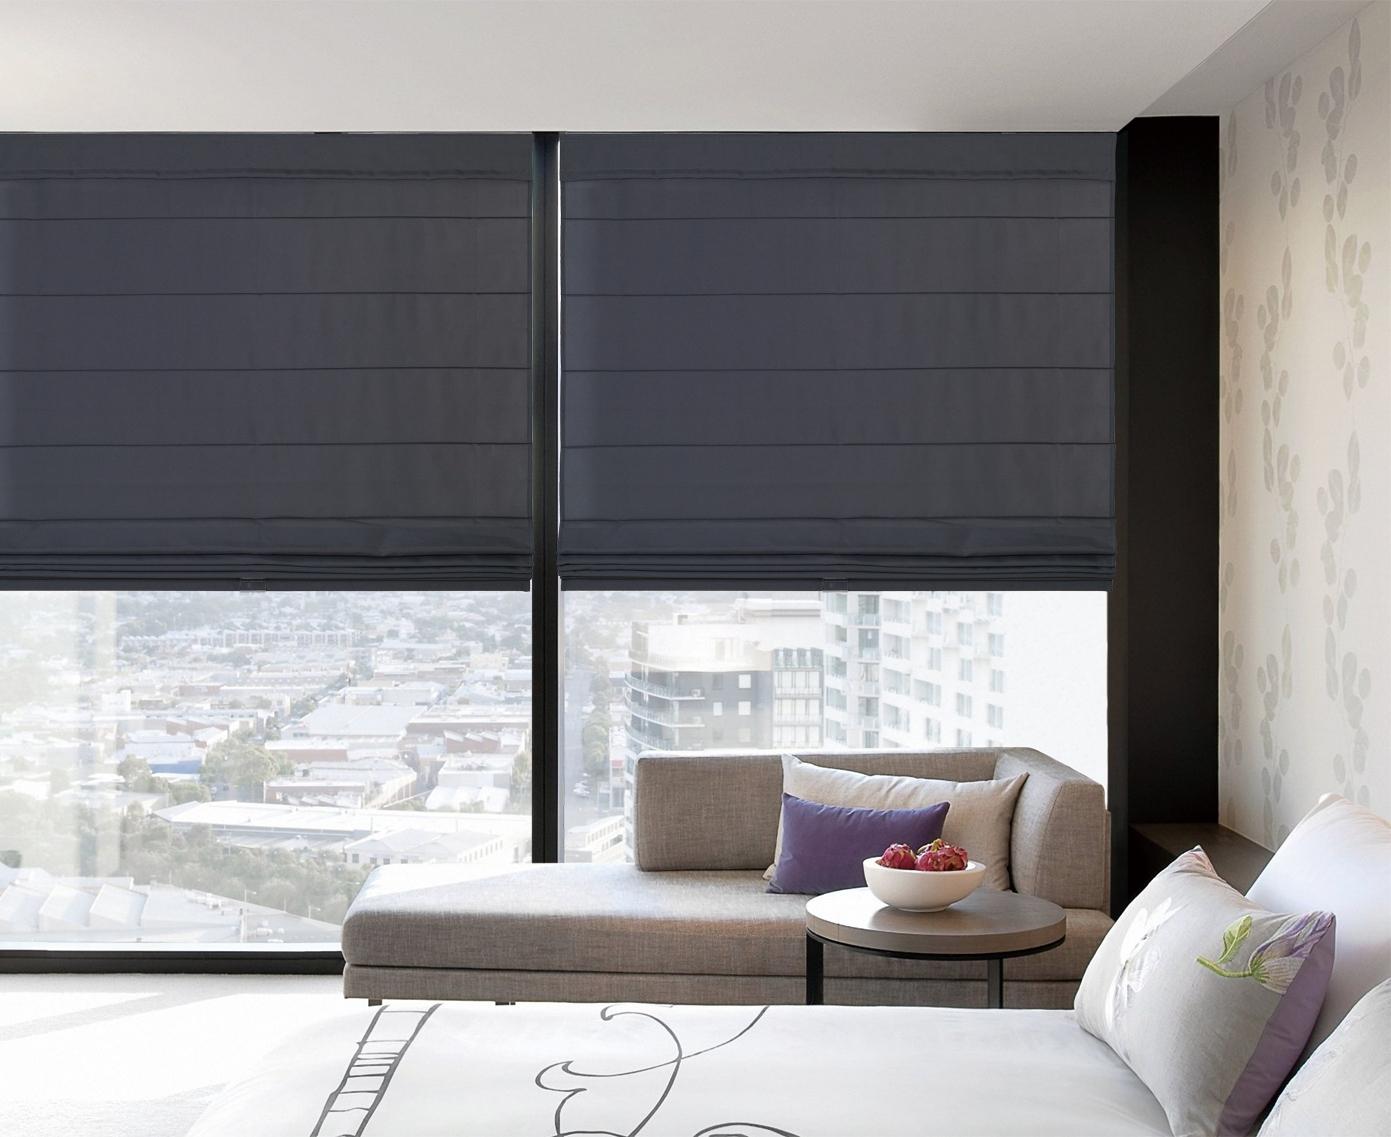 Roman Shades Window Shades SolutionsWindow Shades Solutions